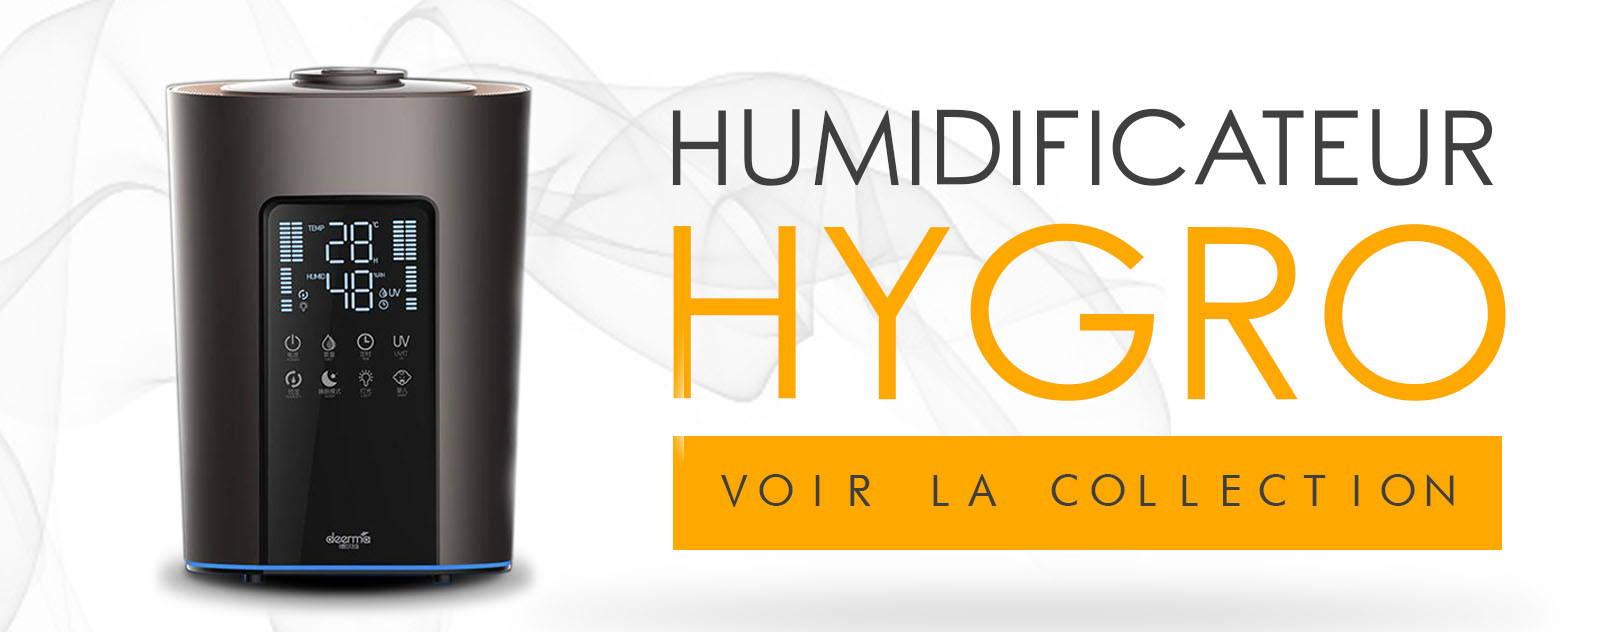 Humidificateur d'air avec Hygrostat